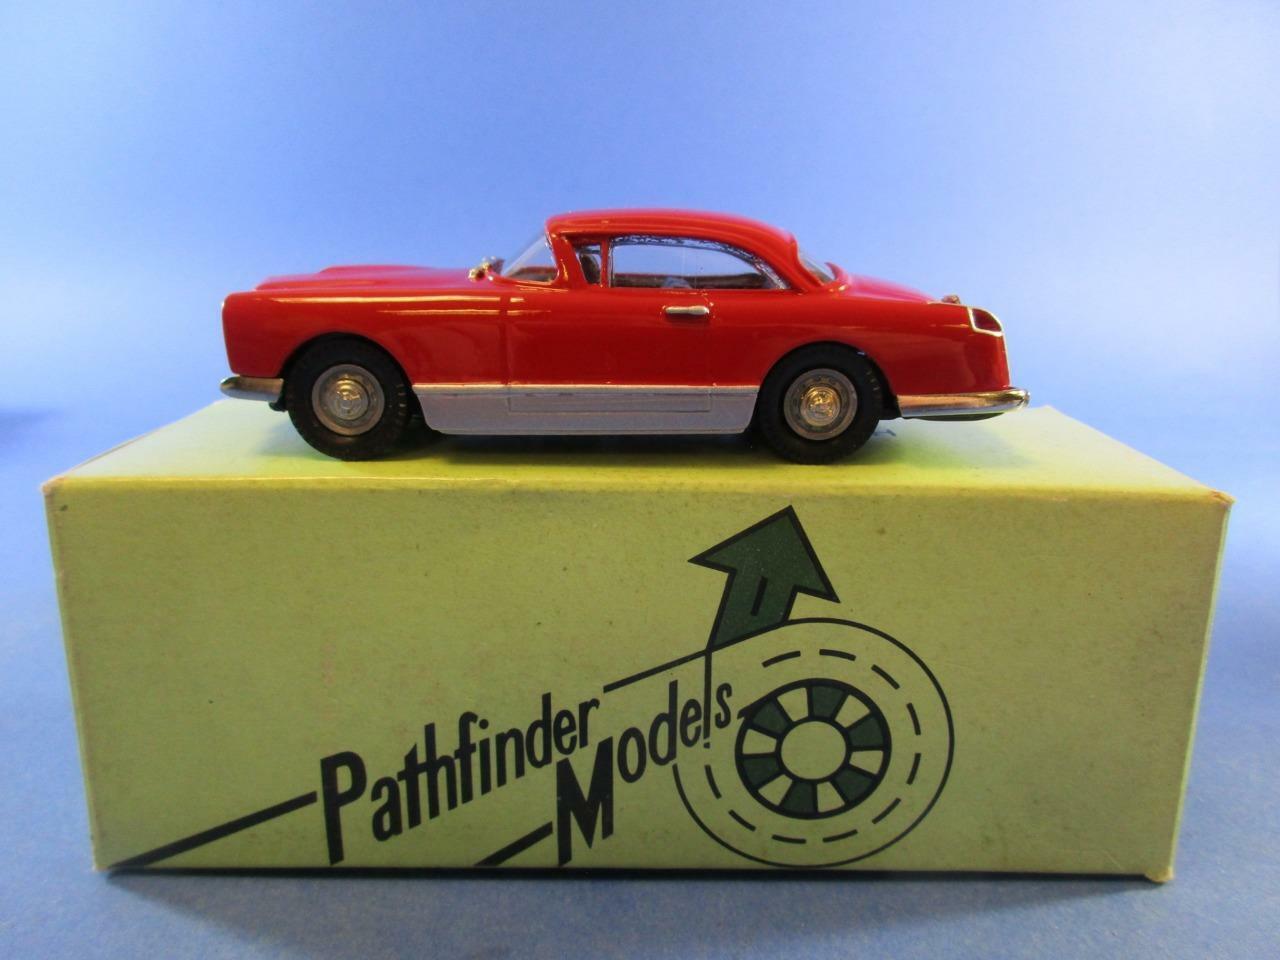 PATHFINDER ModelllS PRMCCI FACEL VEGA HK500, 1 43, MIB